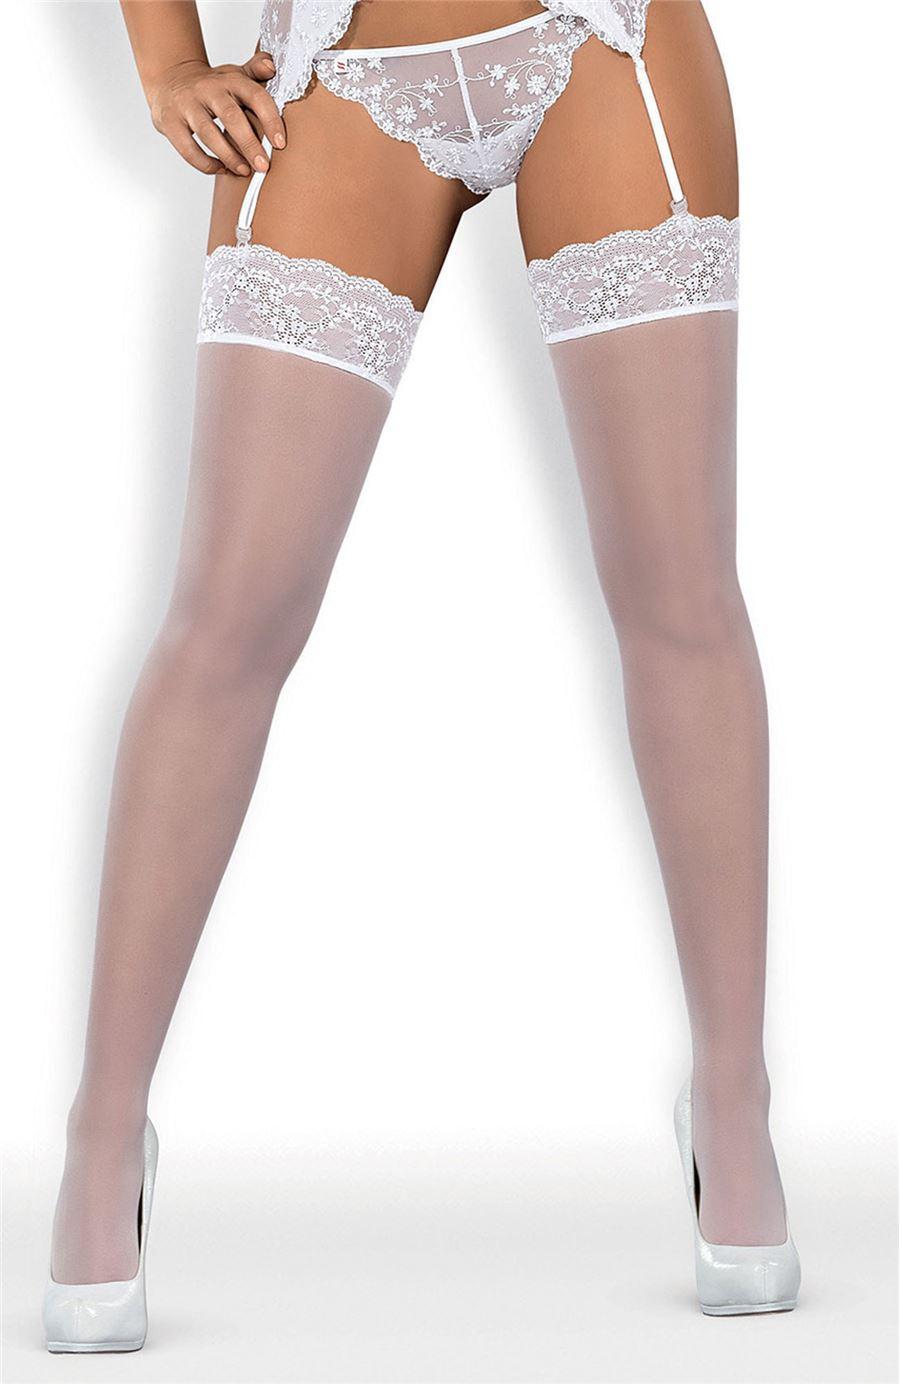 Etheria stockings